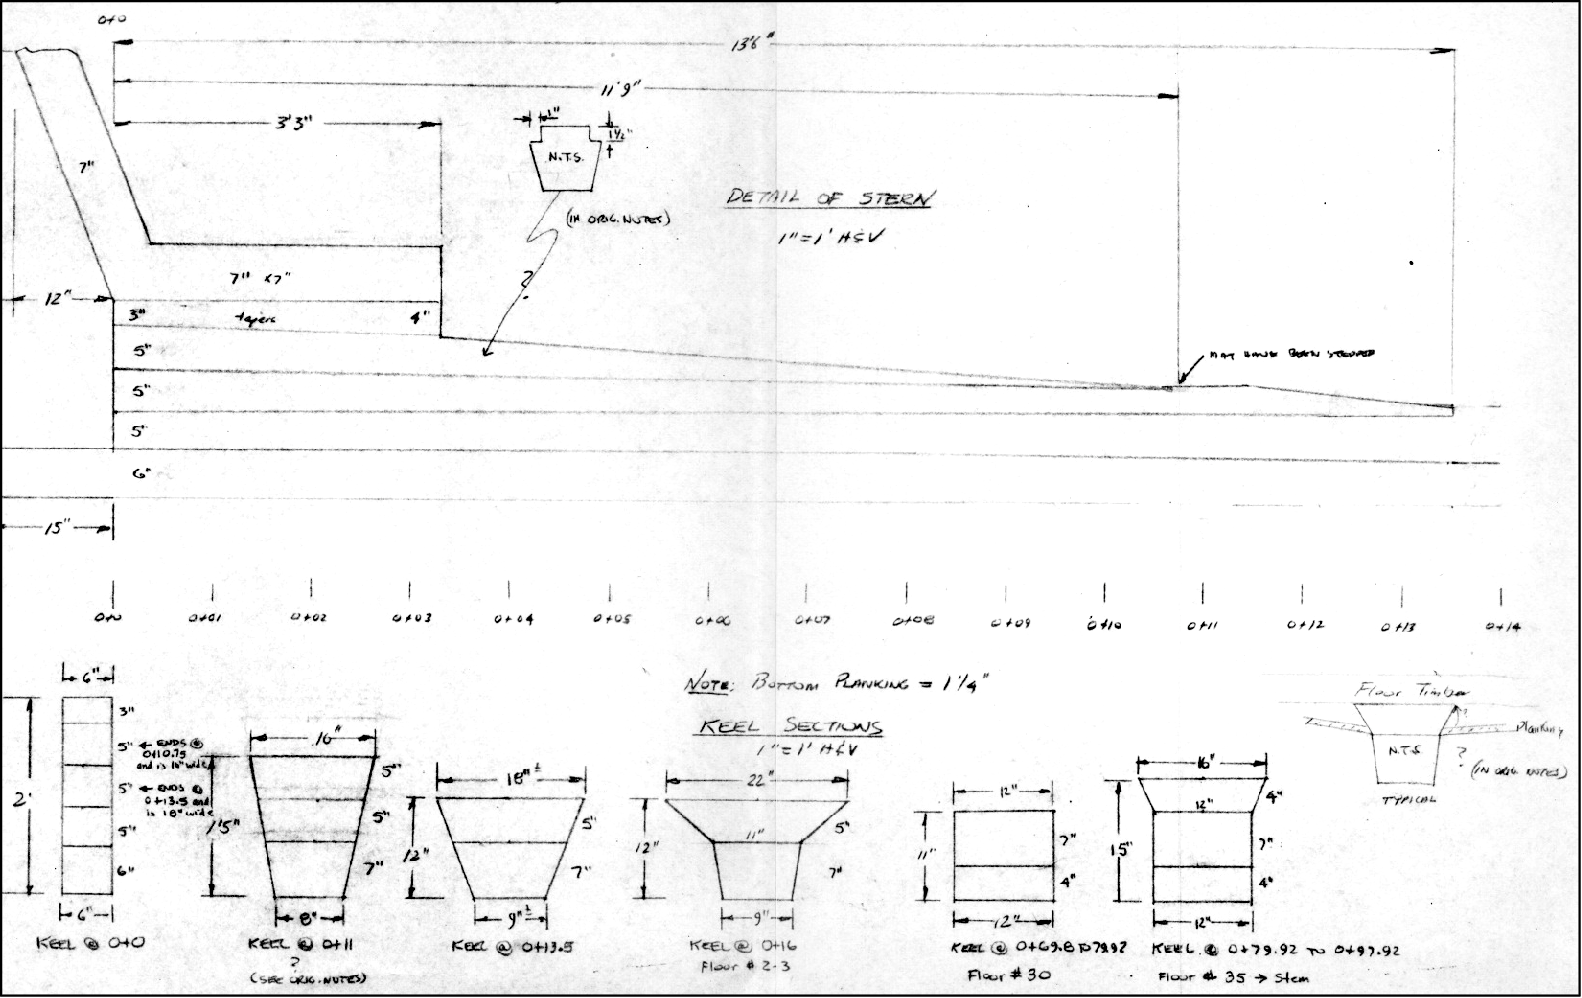 figure 8-4